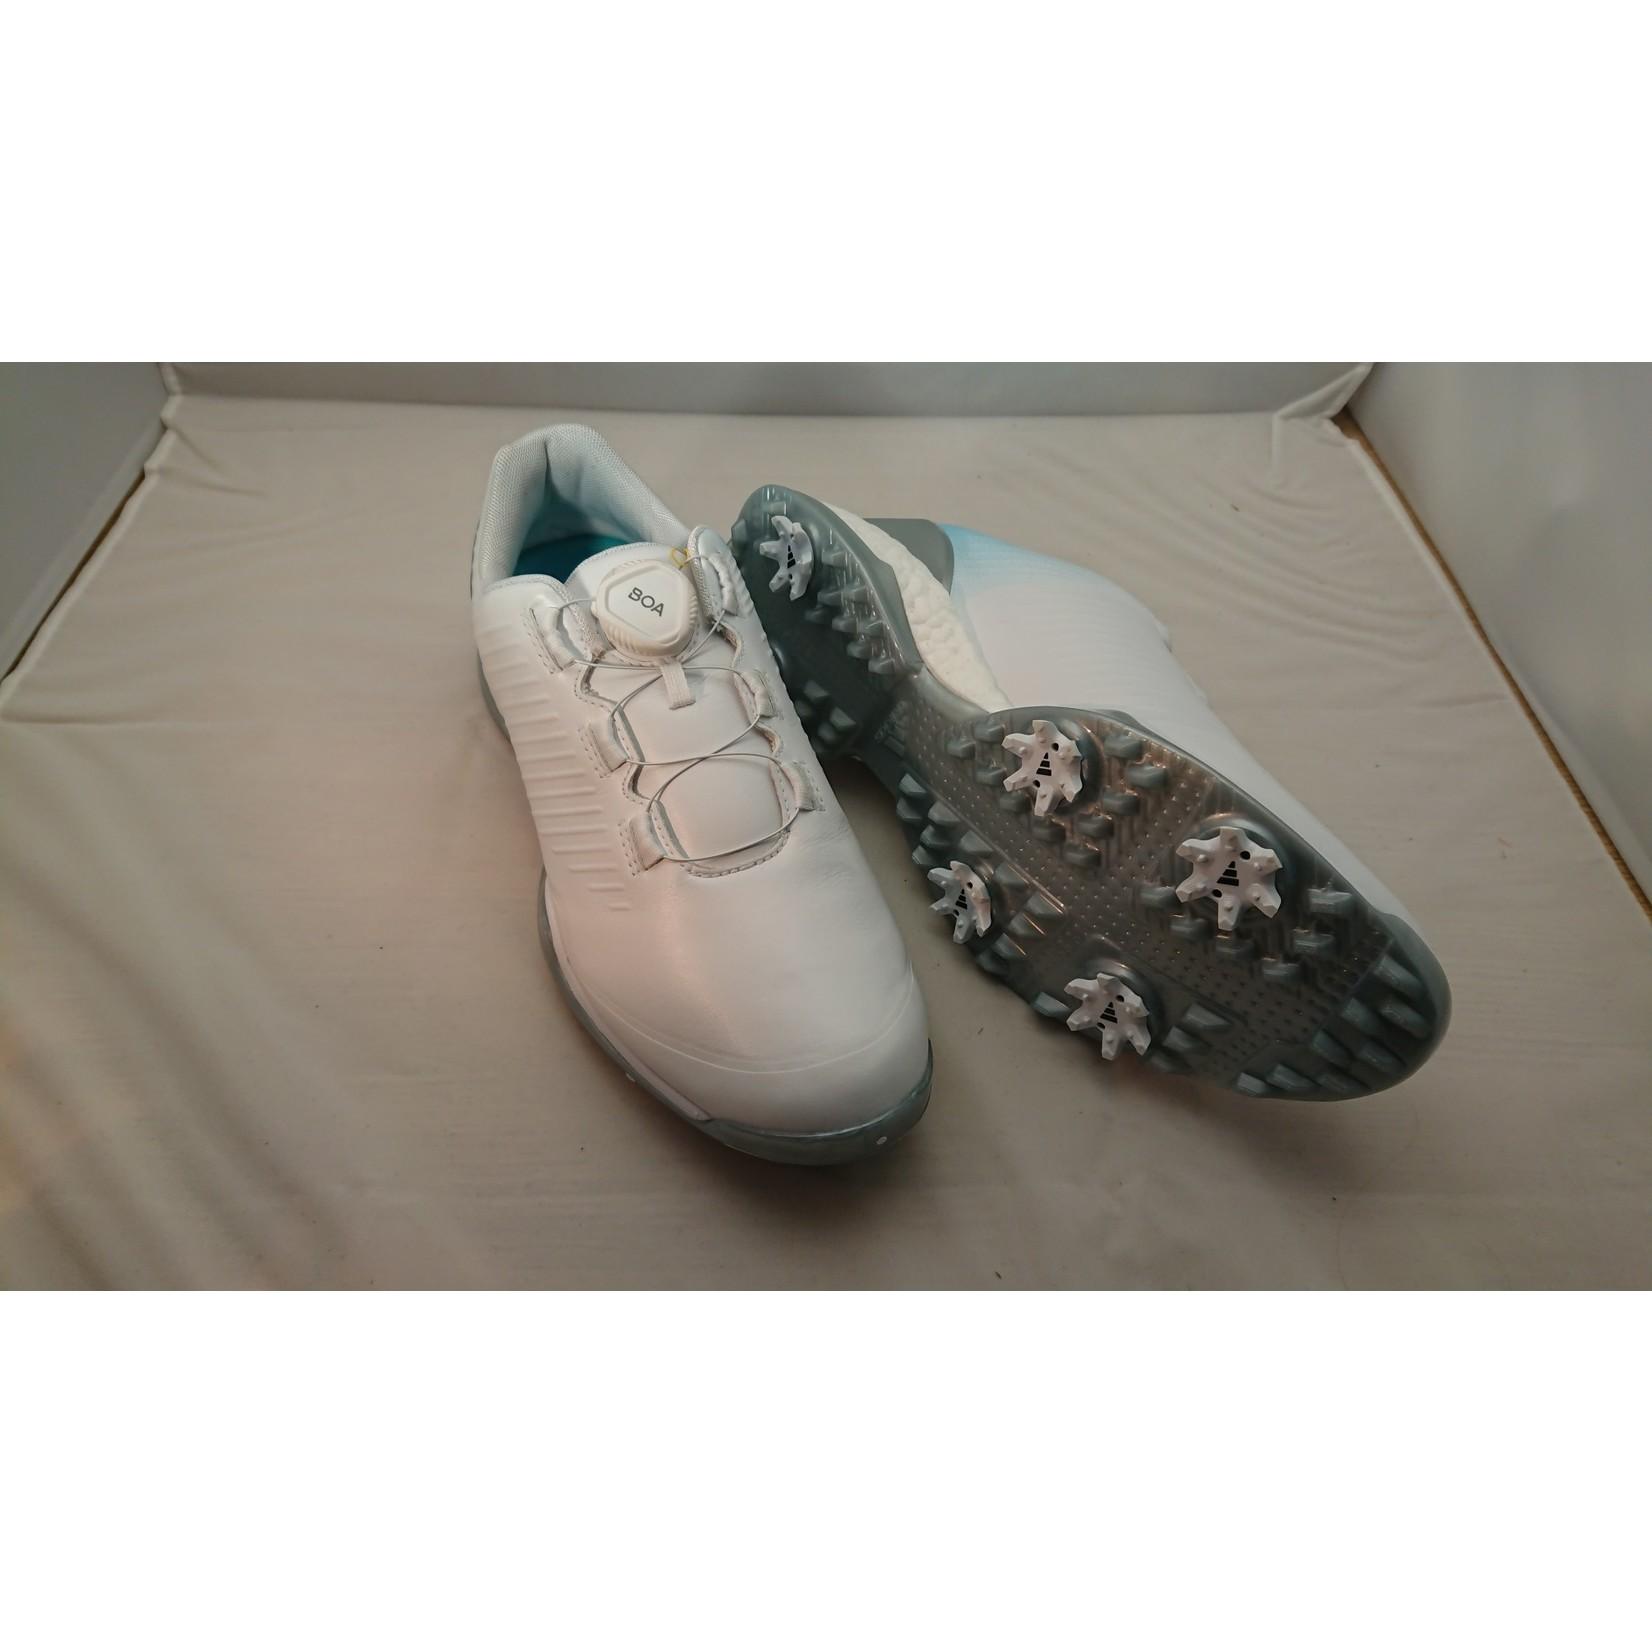 Adidas Adidas W Adipower 4 GED boa Wit 40 2/3